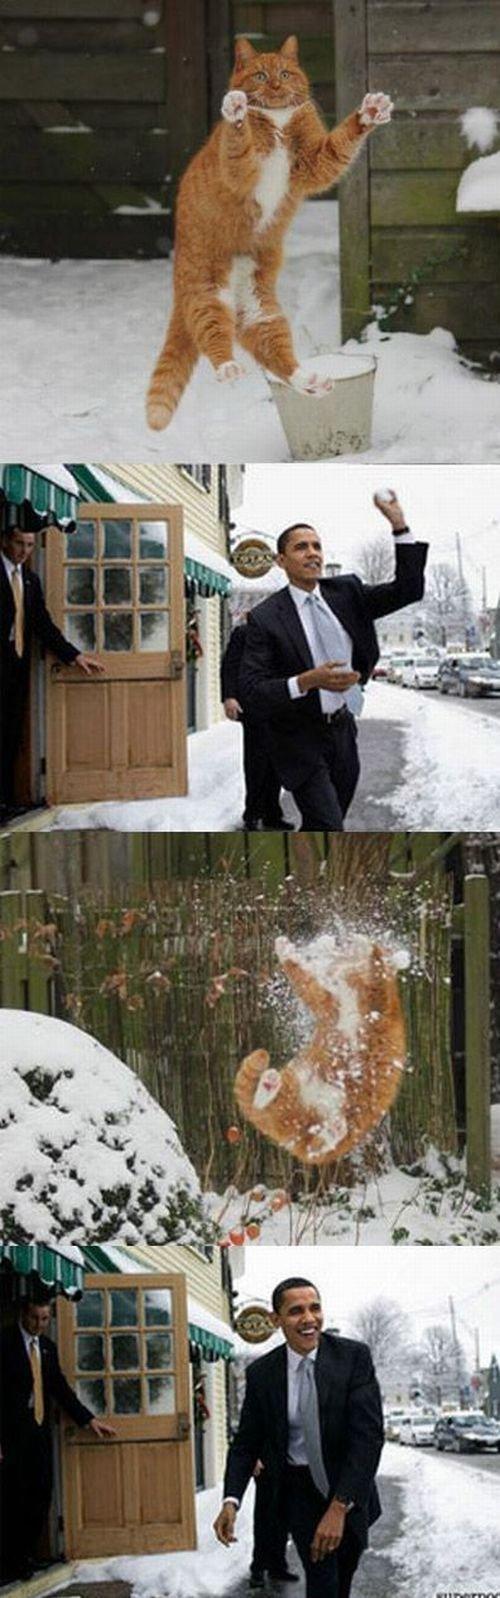 Obama harrasing cats. and enjoying it.. BOOM, headshot! asdasdasdasd